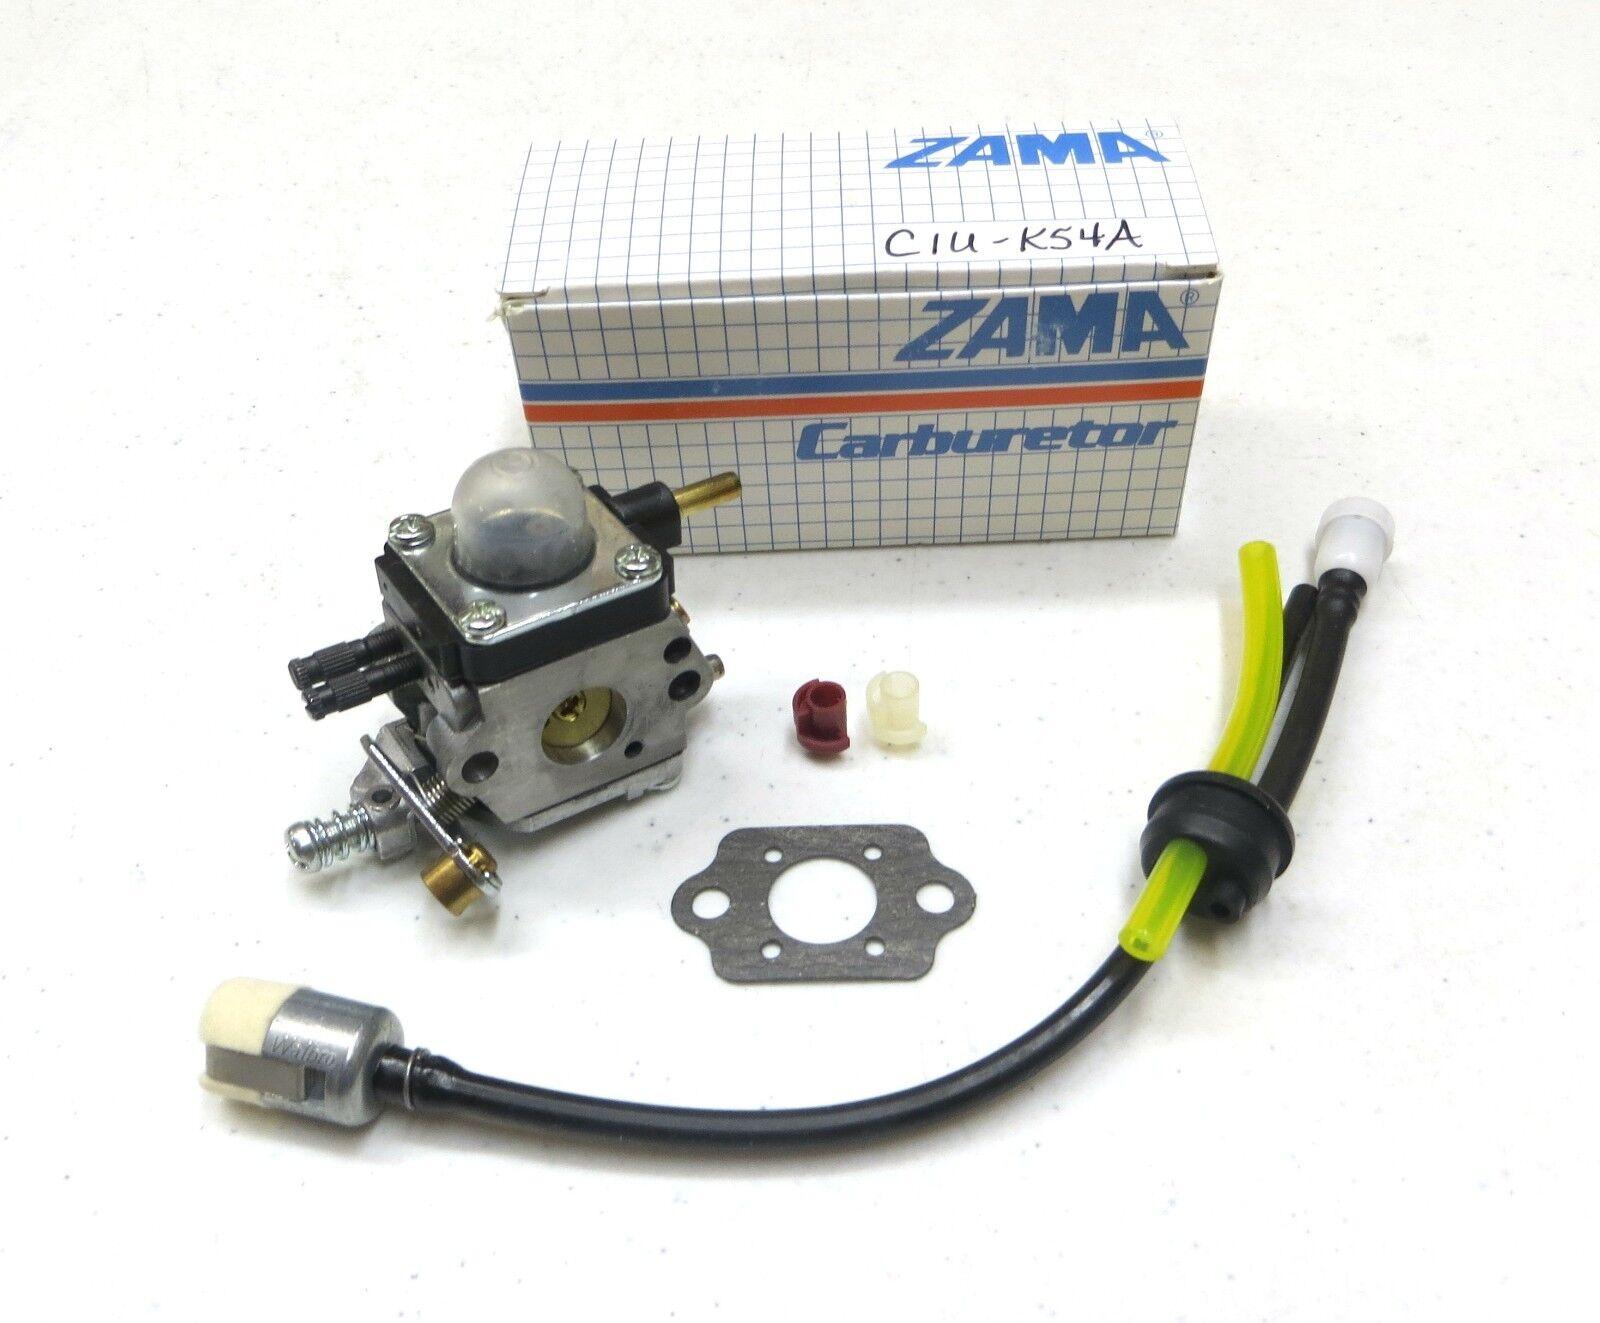 Zama CocheBURADOR & línea de combustible Kit Mantis Hijuelos ECHO sv-5h   2 sv-6 sv-6   1 Motor